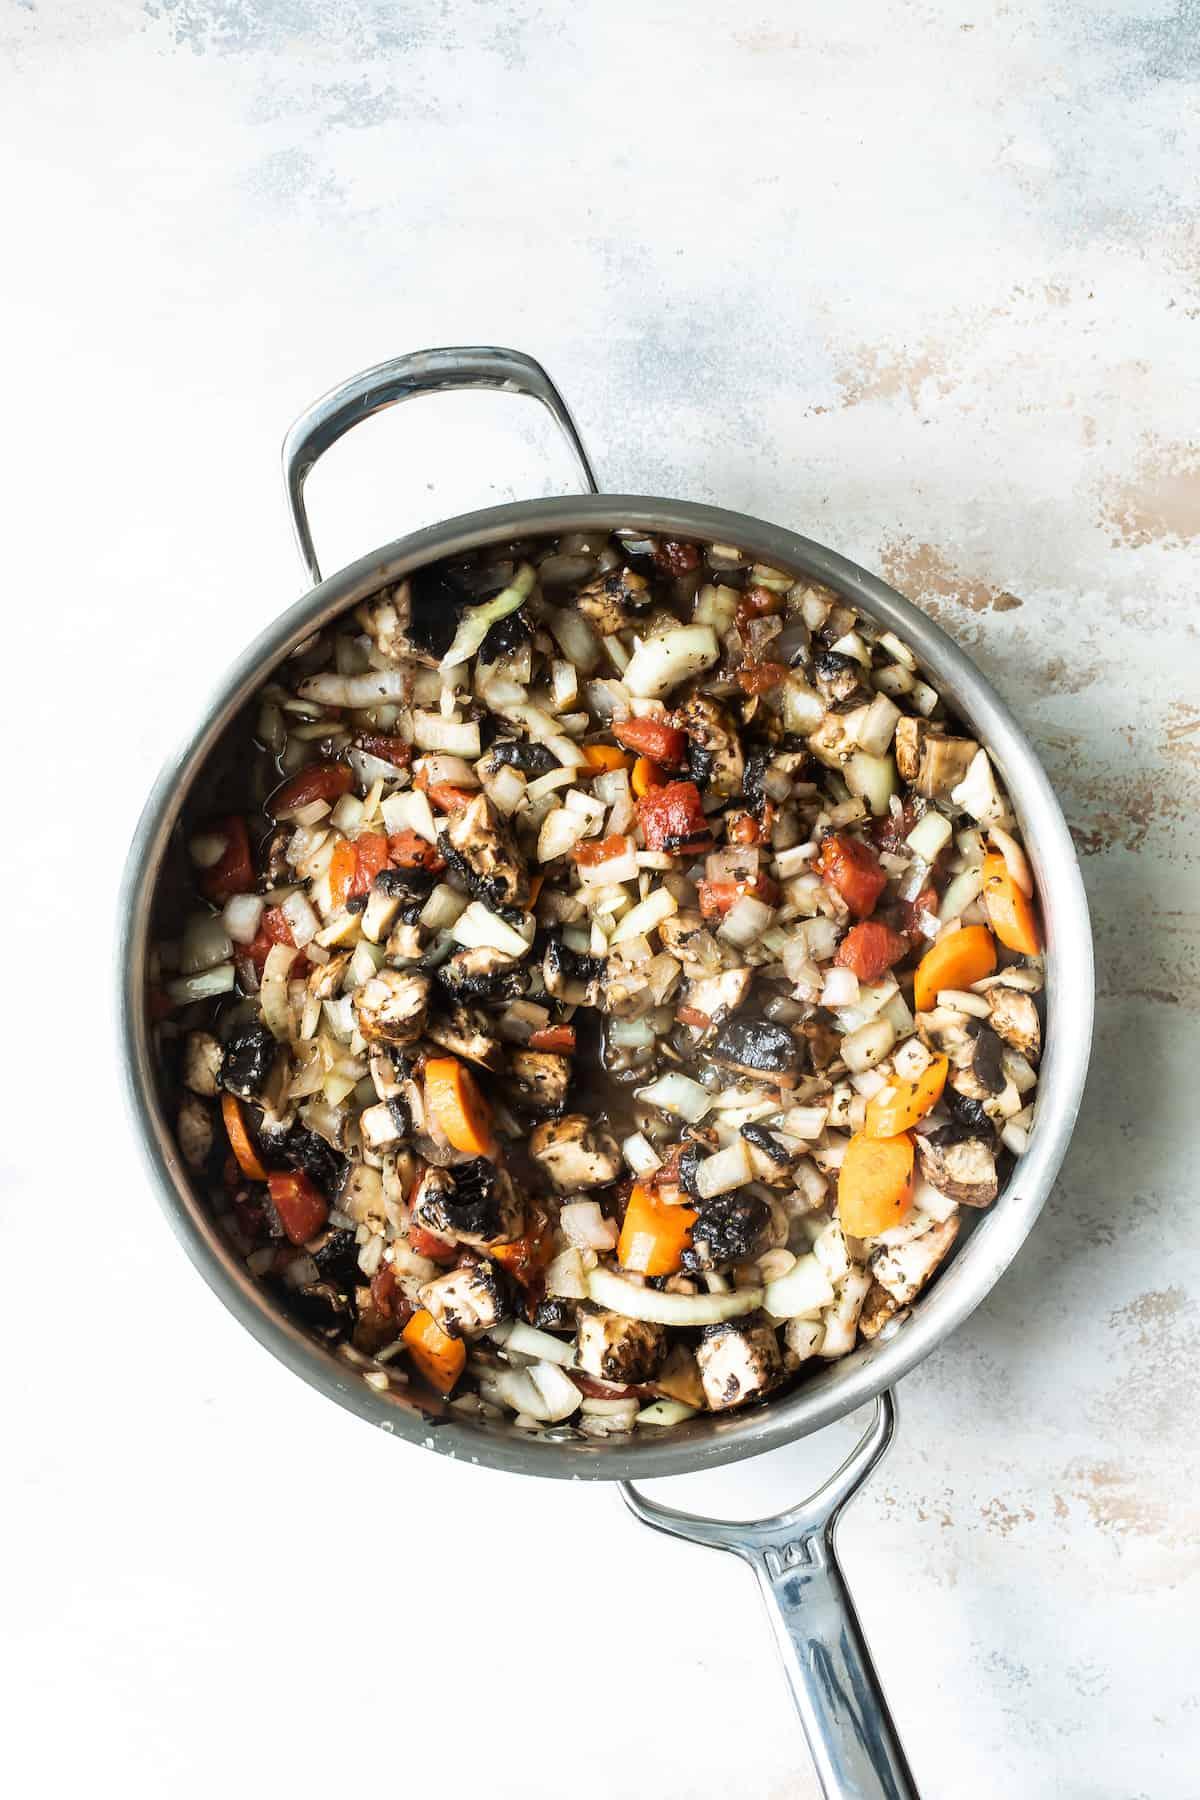 A Skillet Full of the Prepared Mushroom and Vegetable Mixture